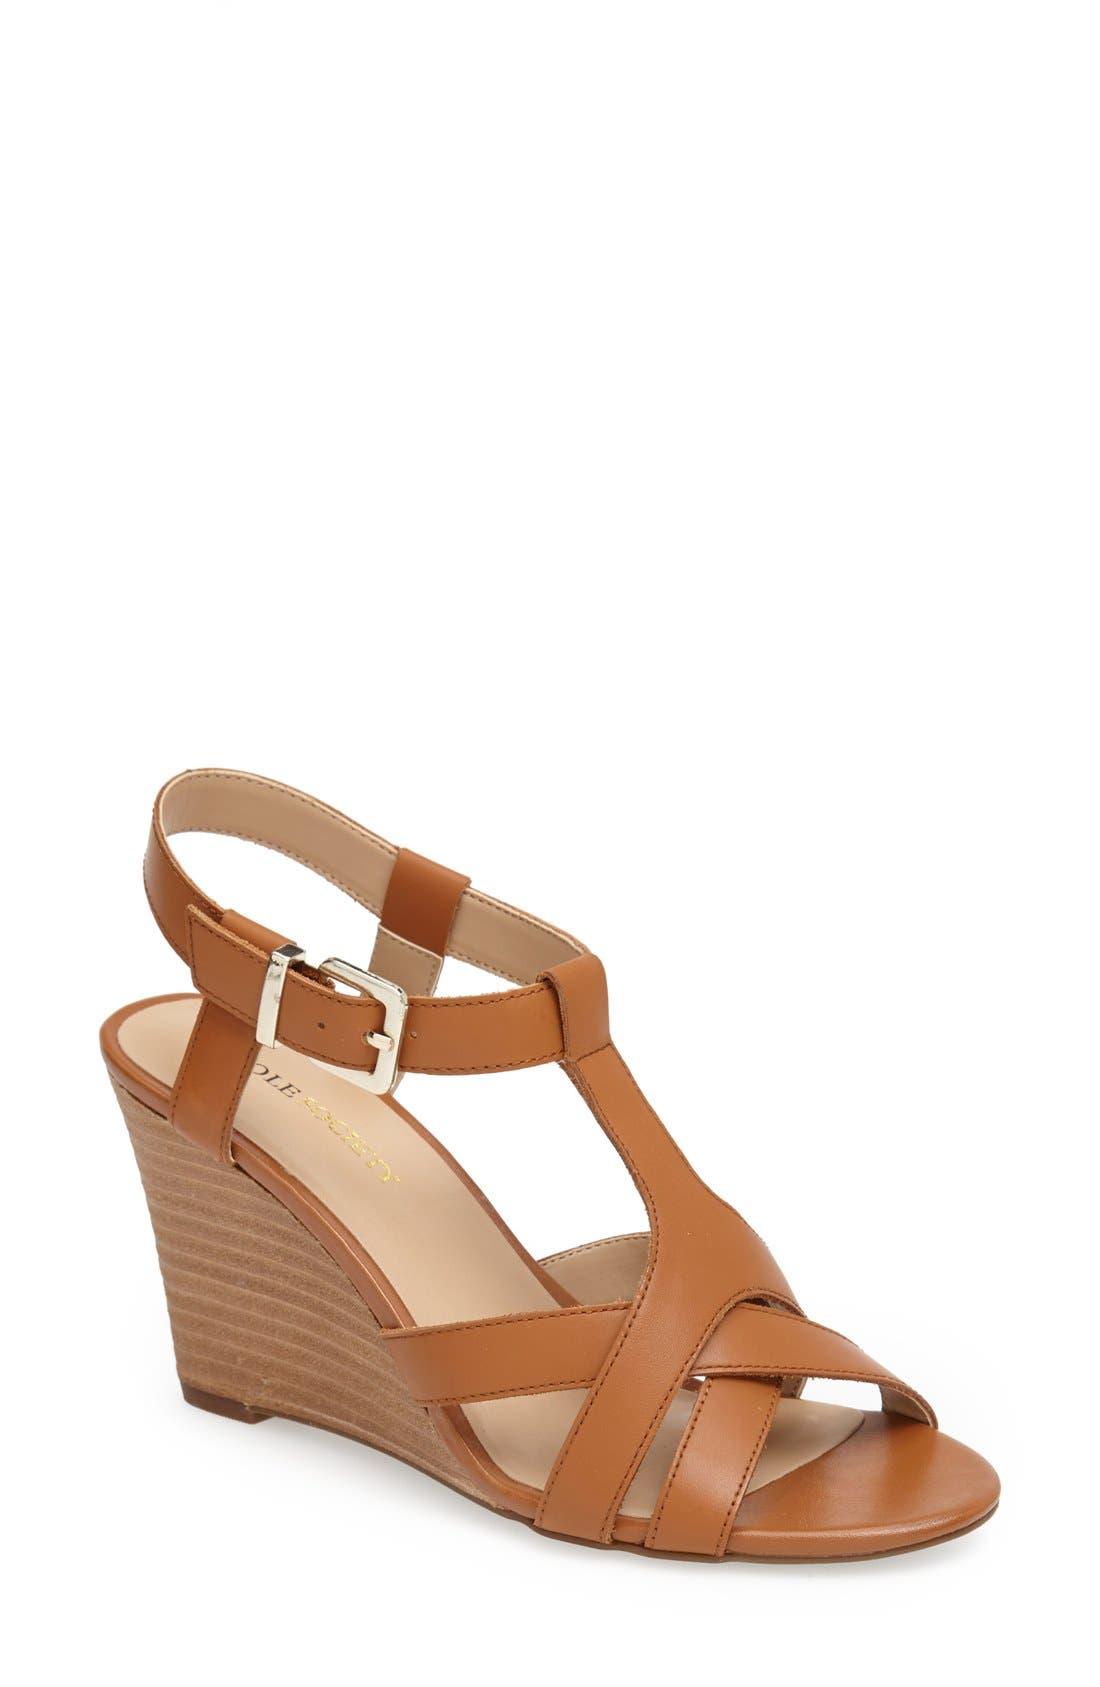 Alternate Image 1 Selected - Sole Society 'Metsey' Wedge Sandal (Women)